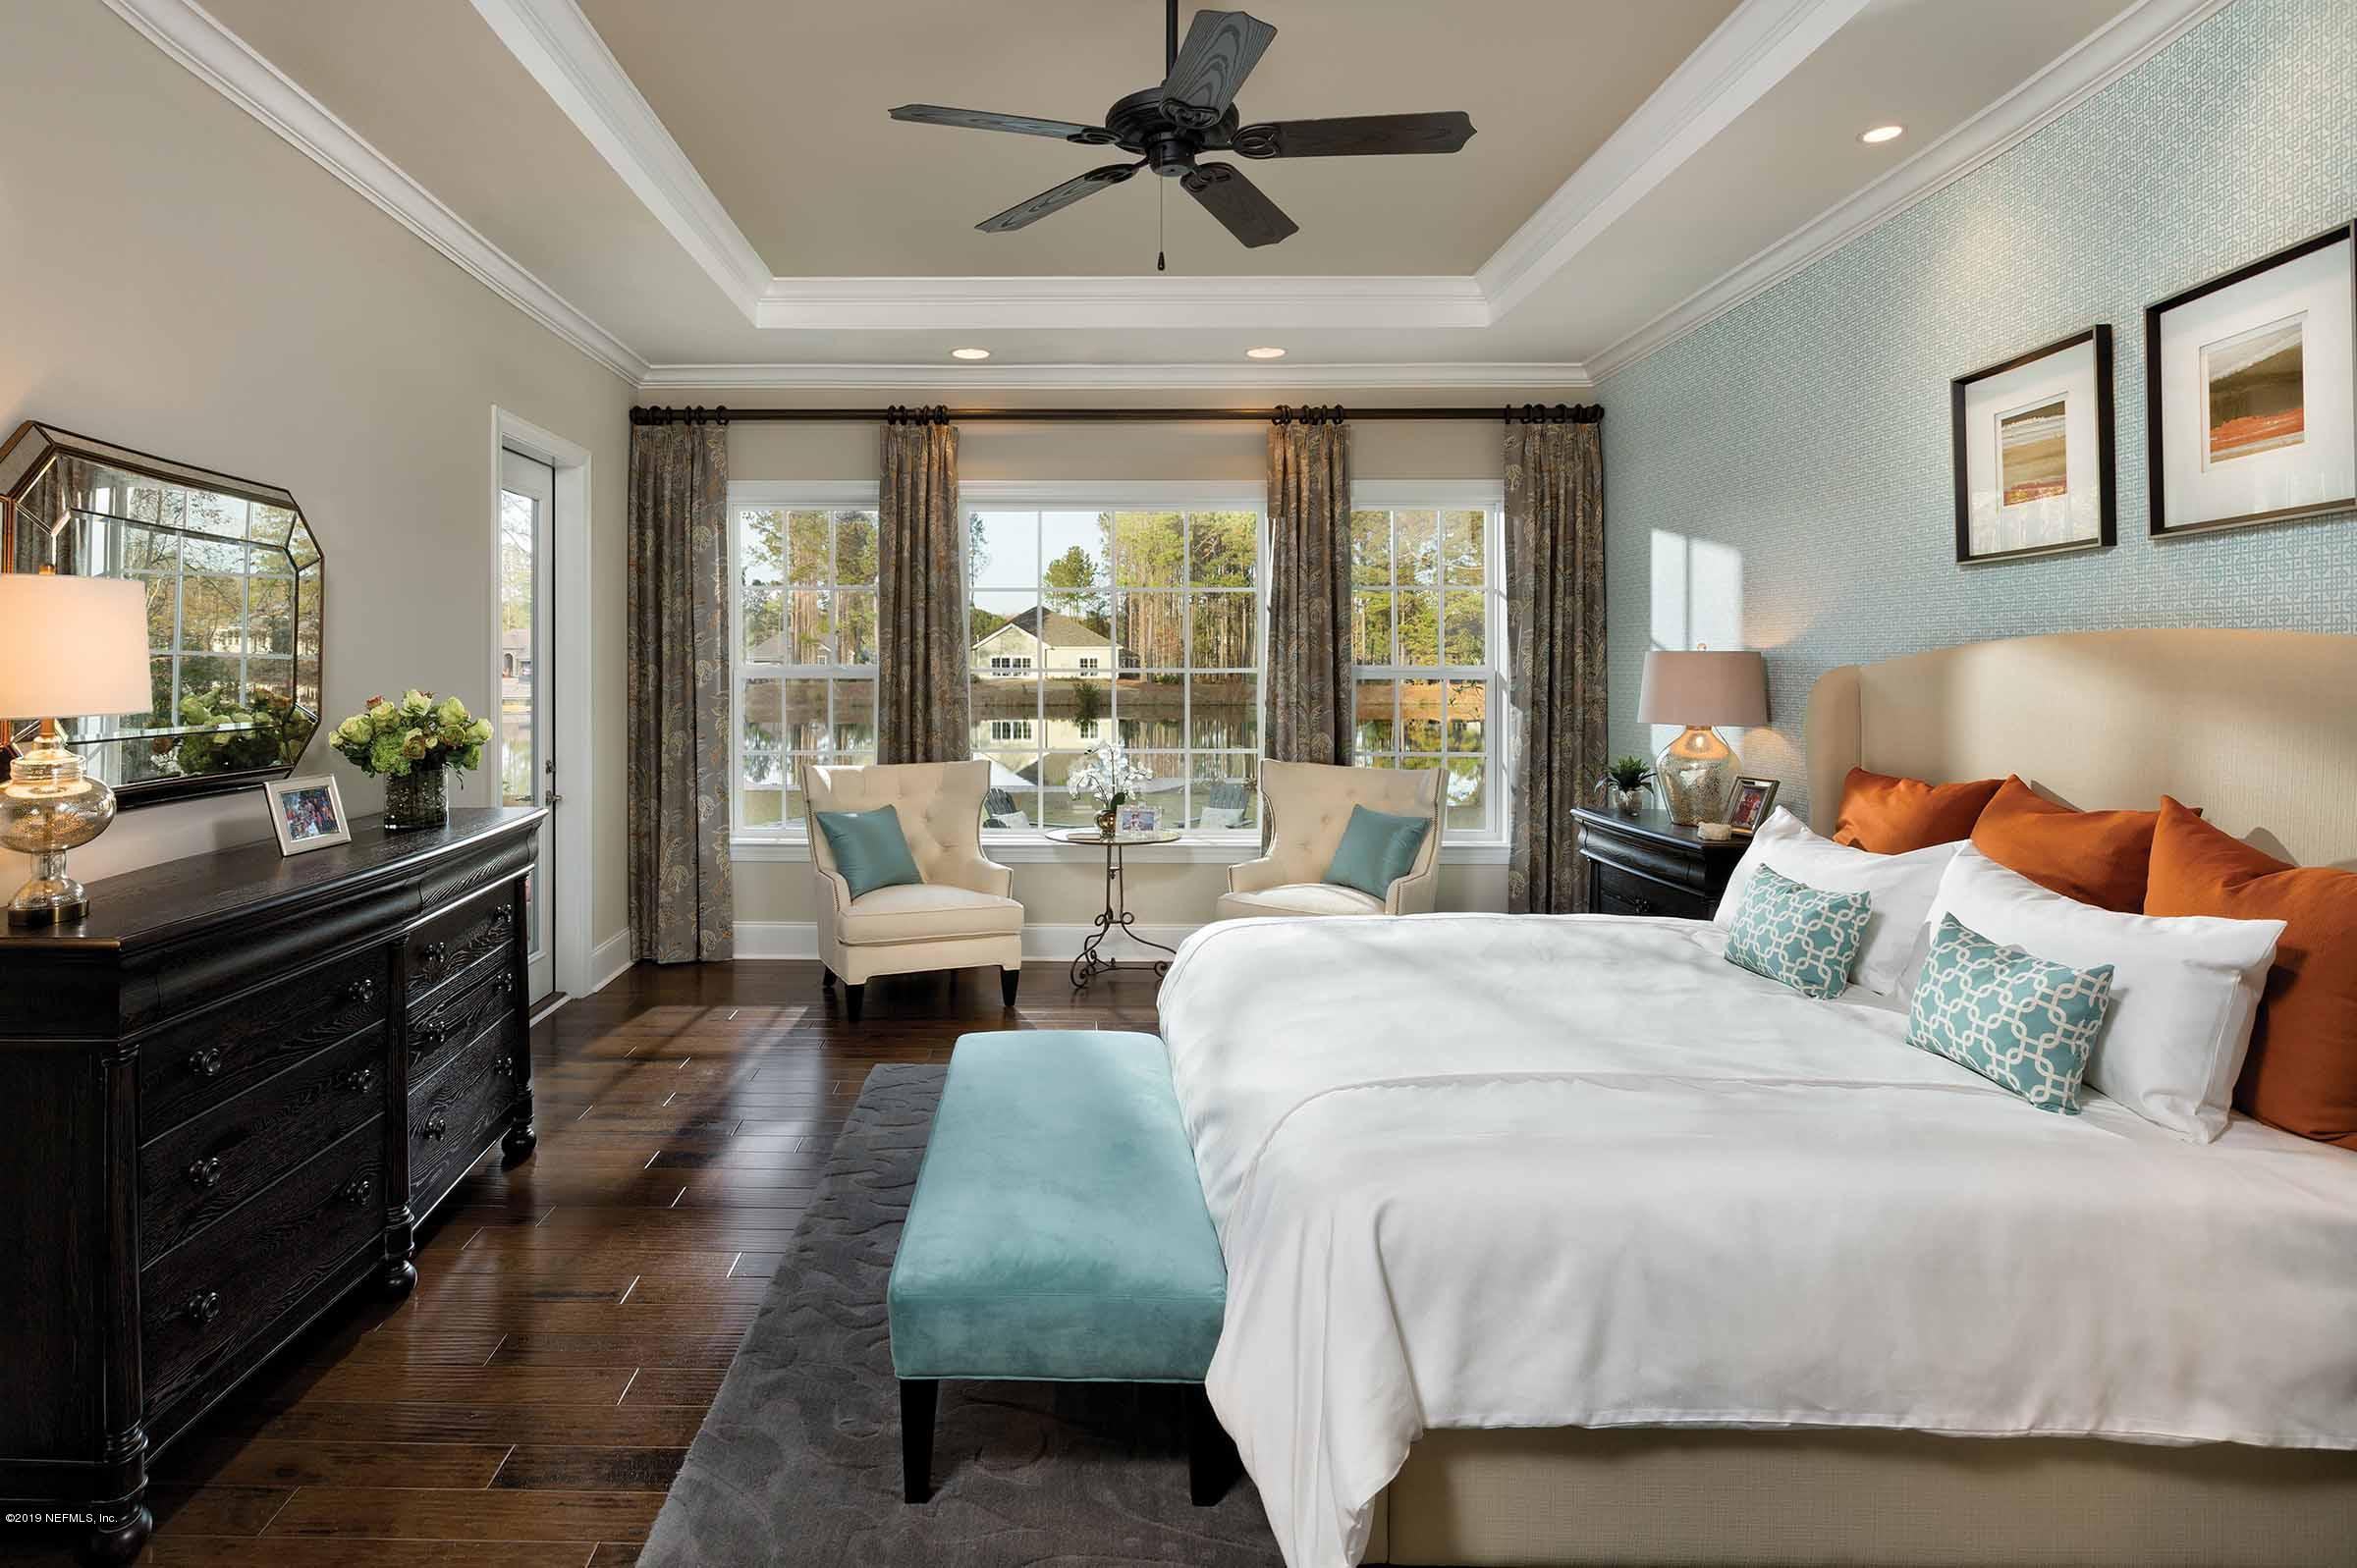 96012 BRADY POINT, FERNANDINA BEACH, FLORIDA 32034, 3 Bedrooms Bedrooms, ,3 BathroomsBathrooms,Residential - single family,For sale,BRADY POINT,984759